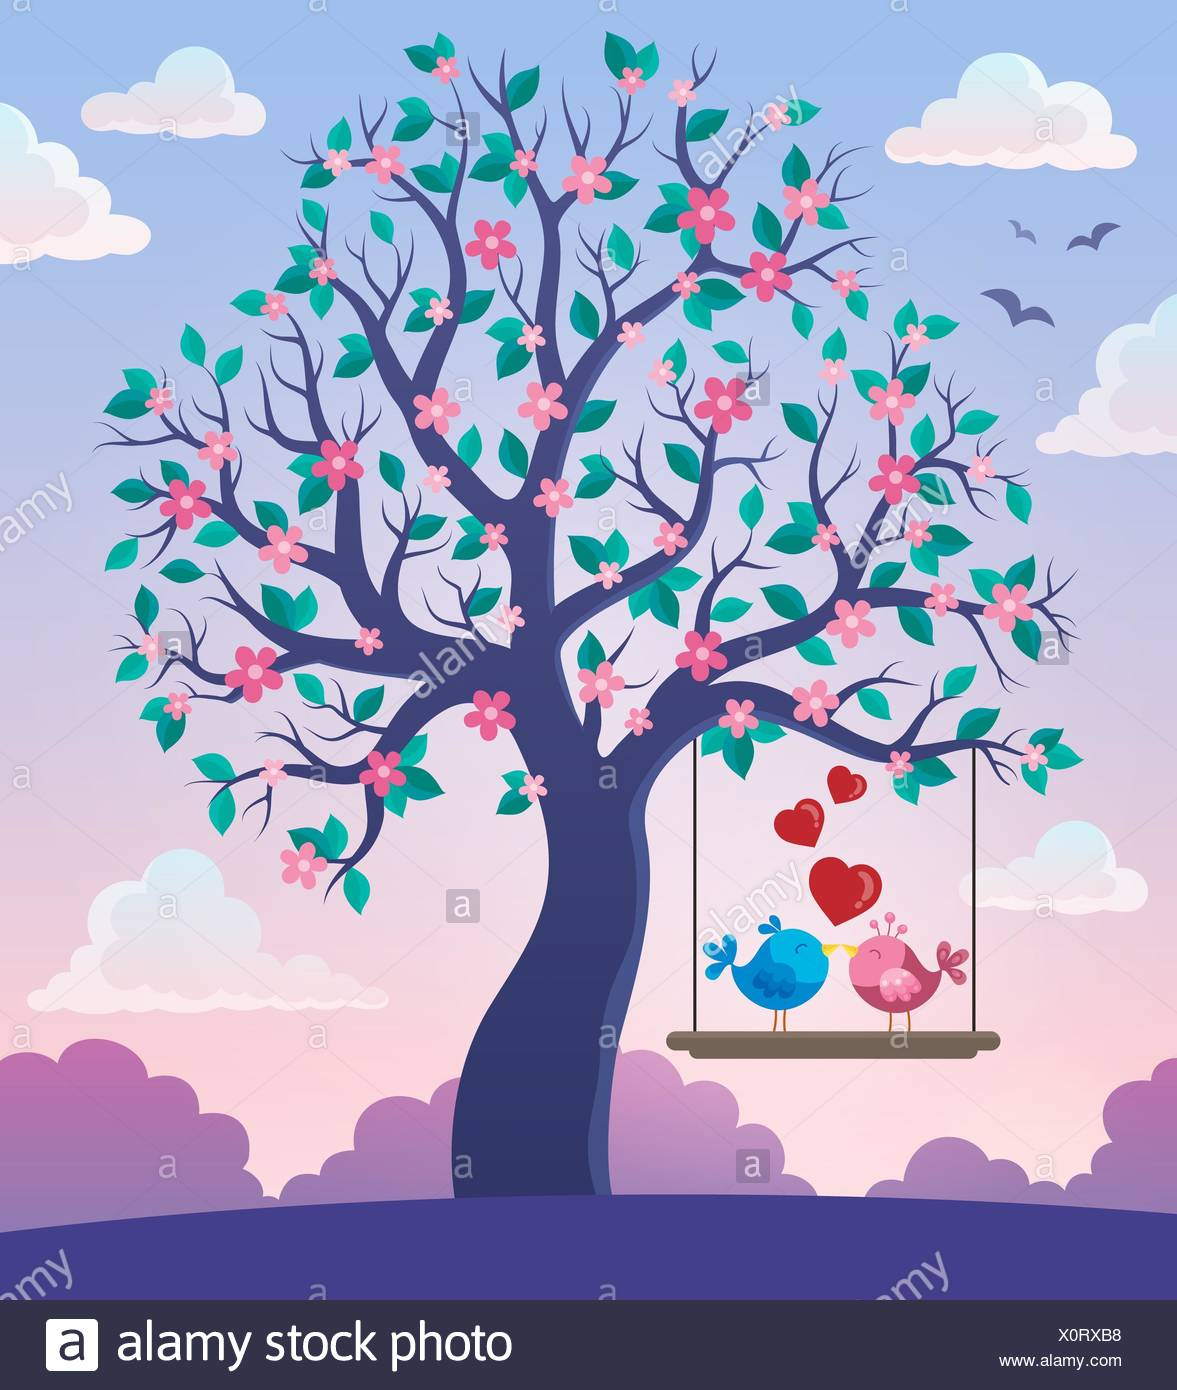 Tree with Valentine birds theme 2 - Stock Image